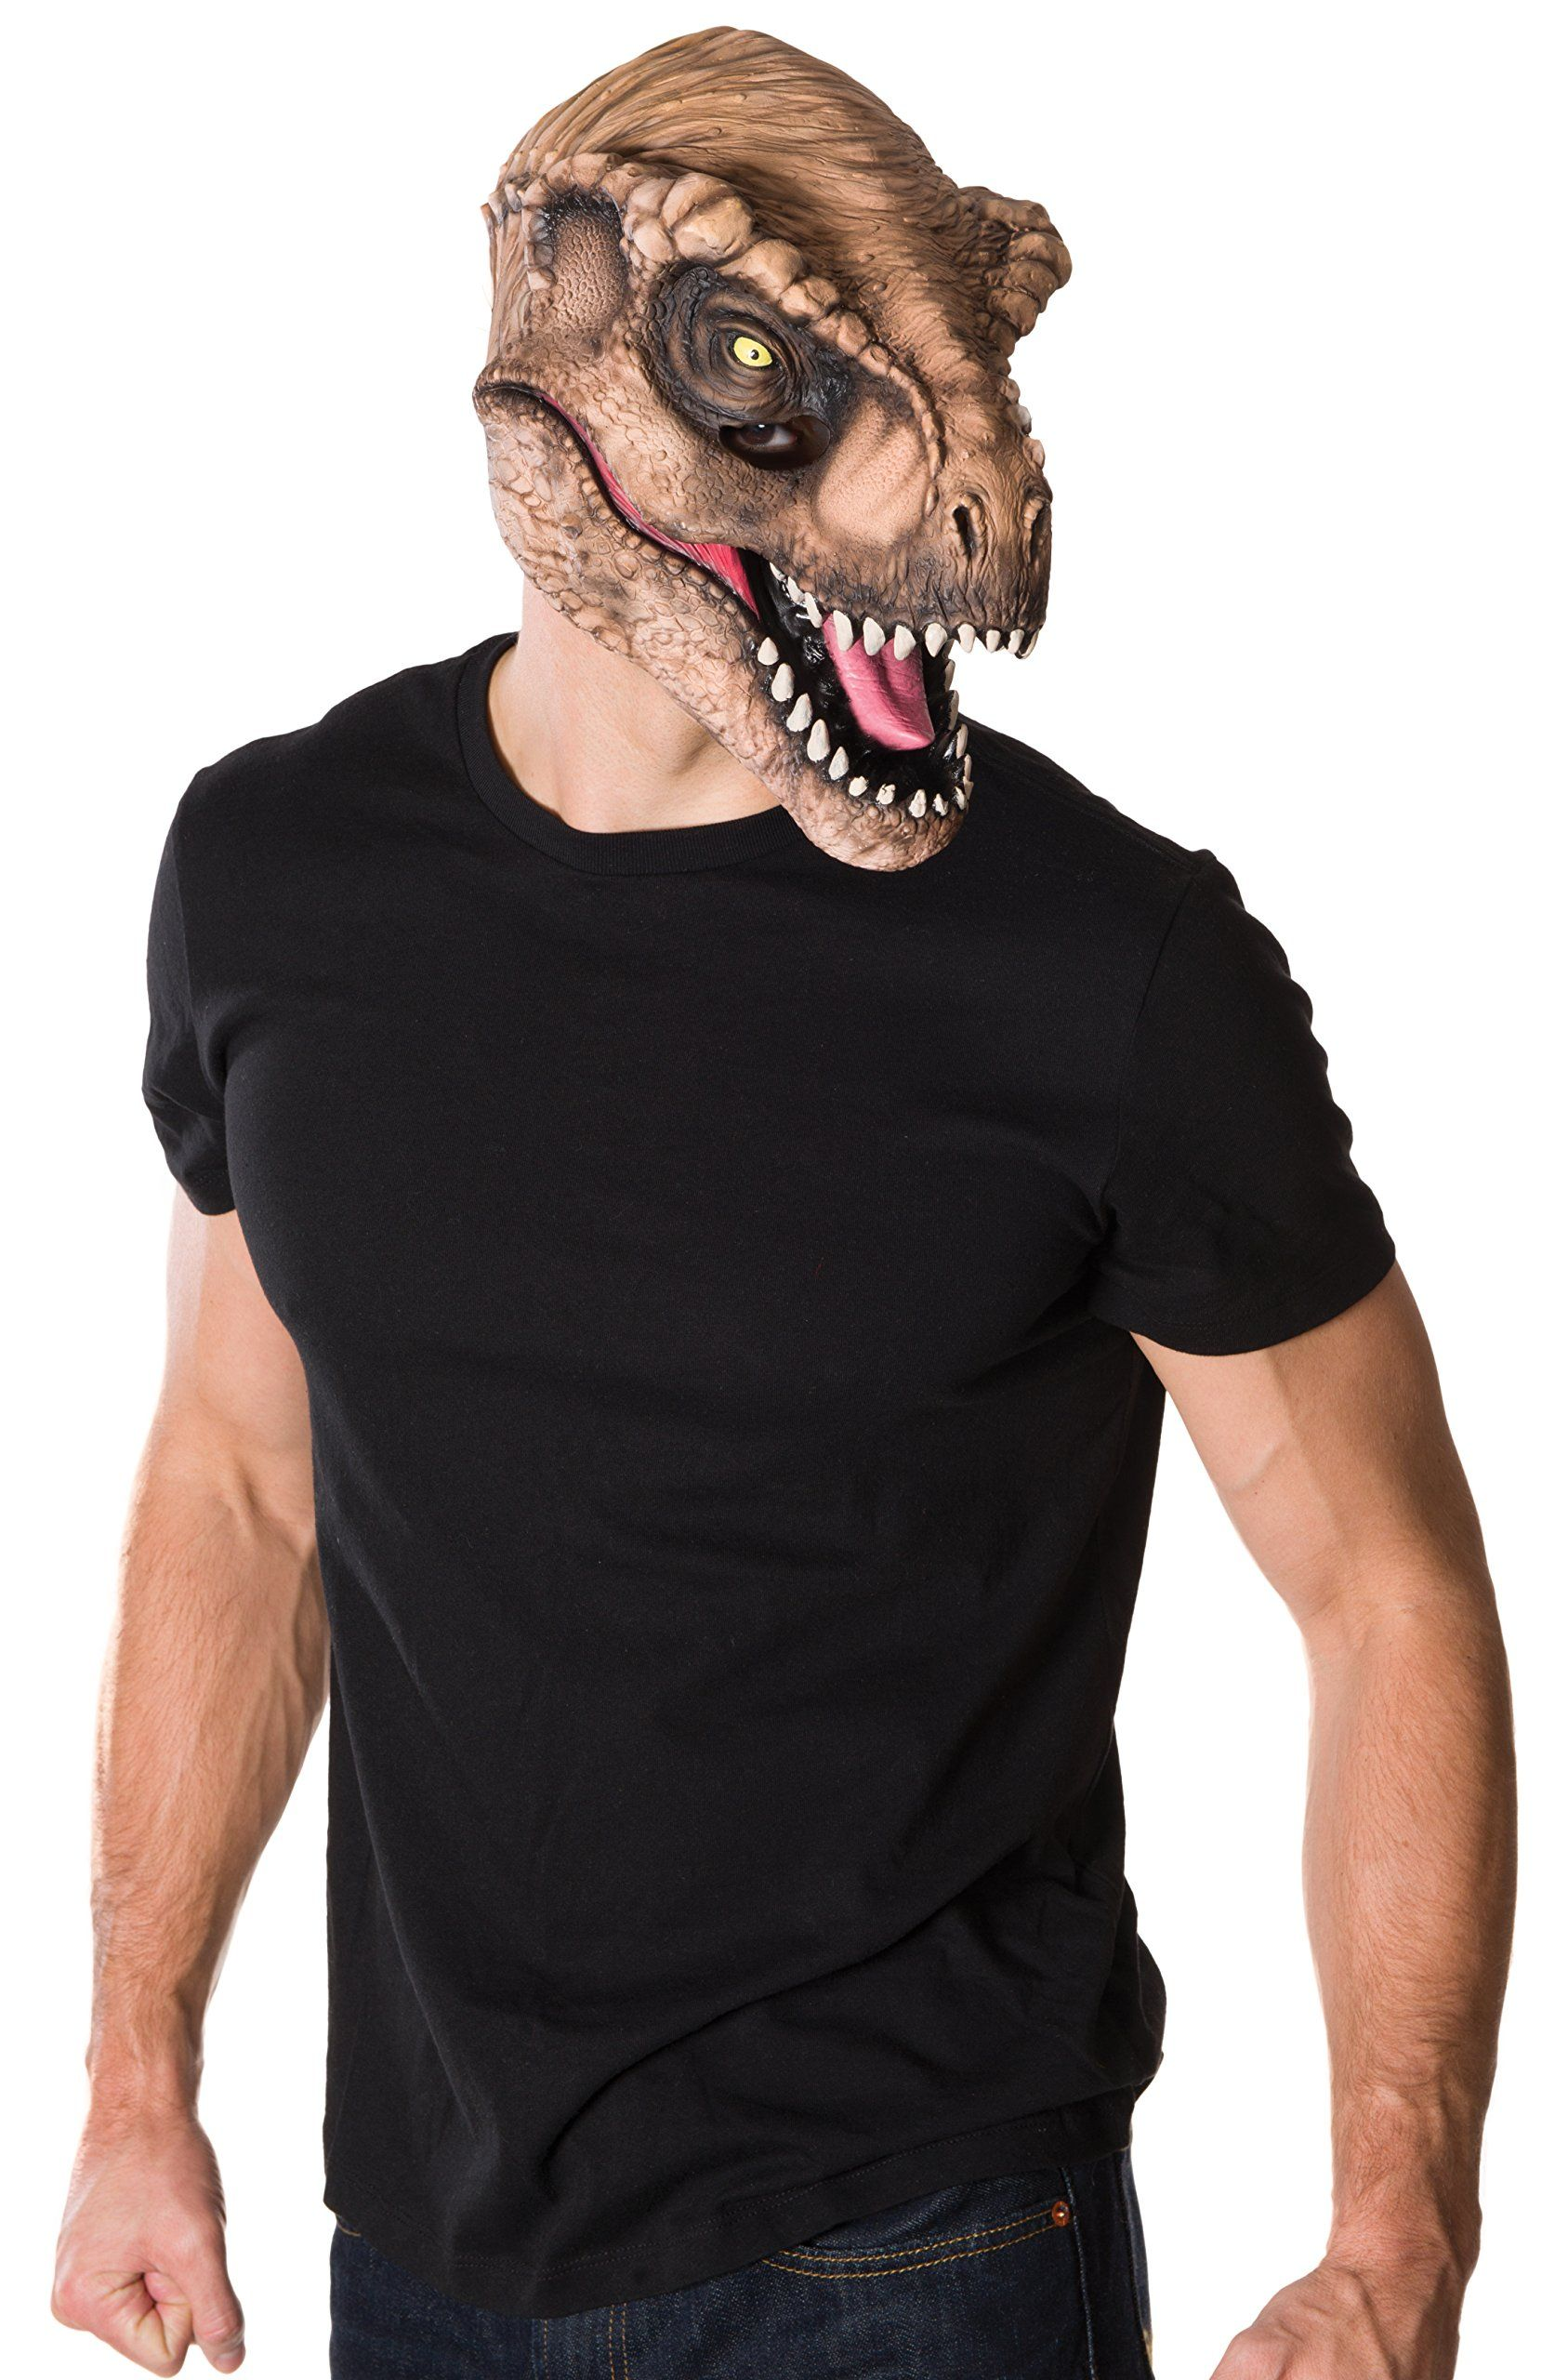 Amazon.com: Rubie's Costume Co Men's Jurassic World T-Rex 3/4 Mask ...